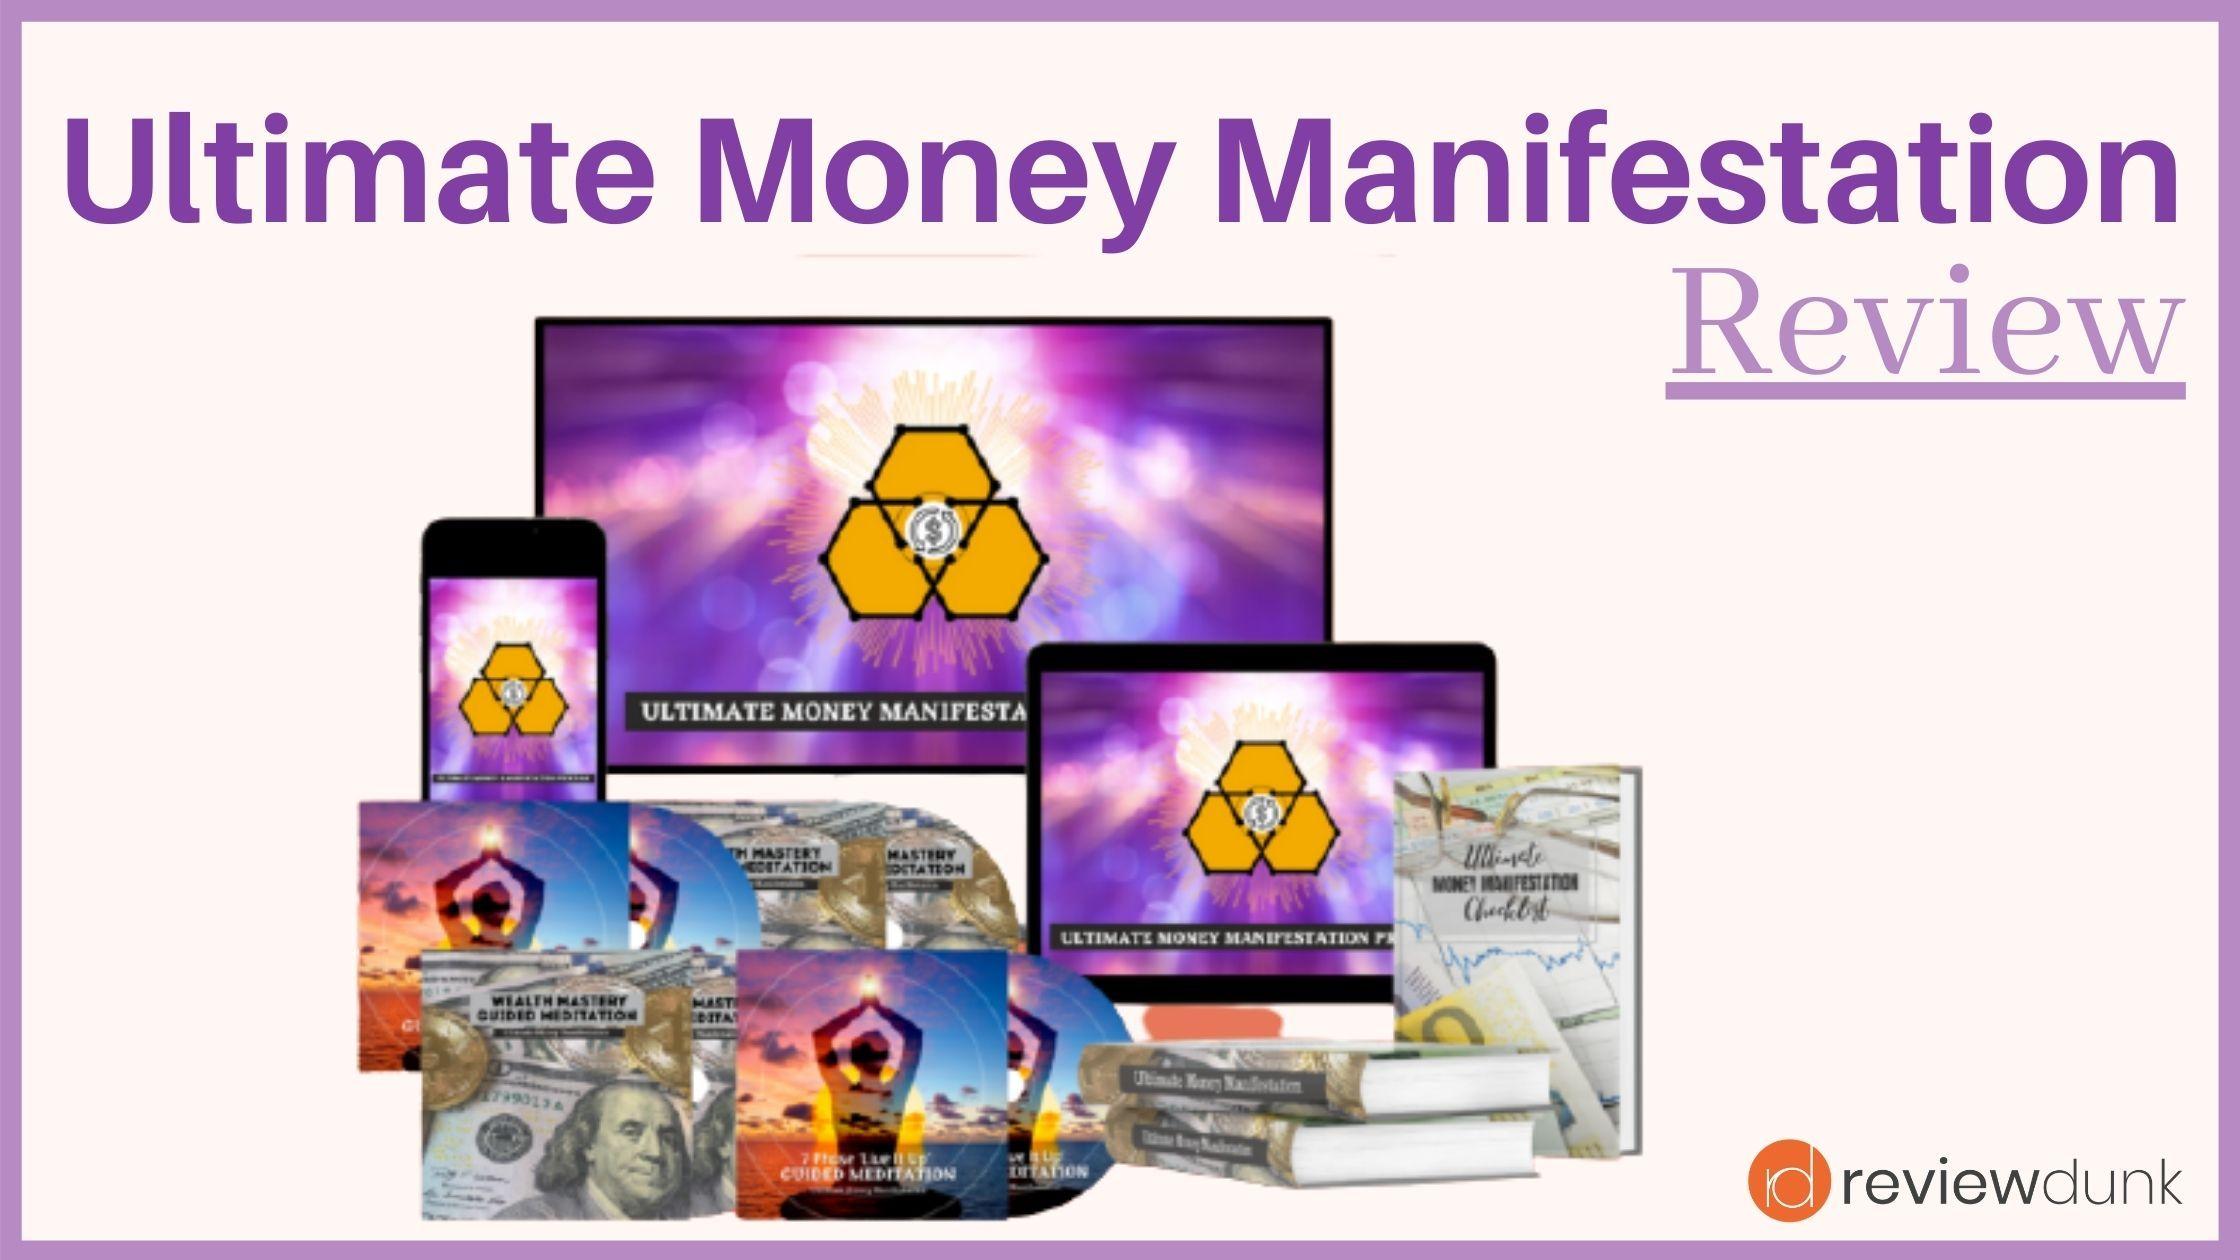 Ultimate Money Manifestation